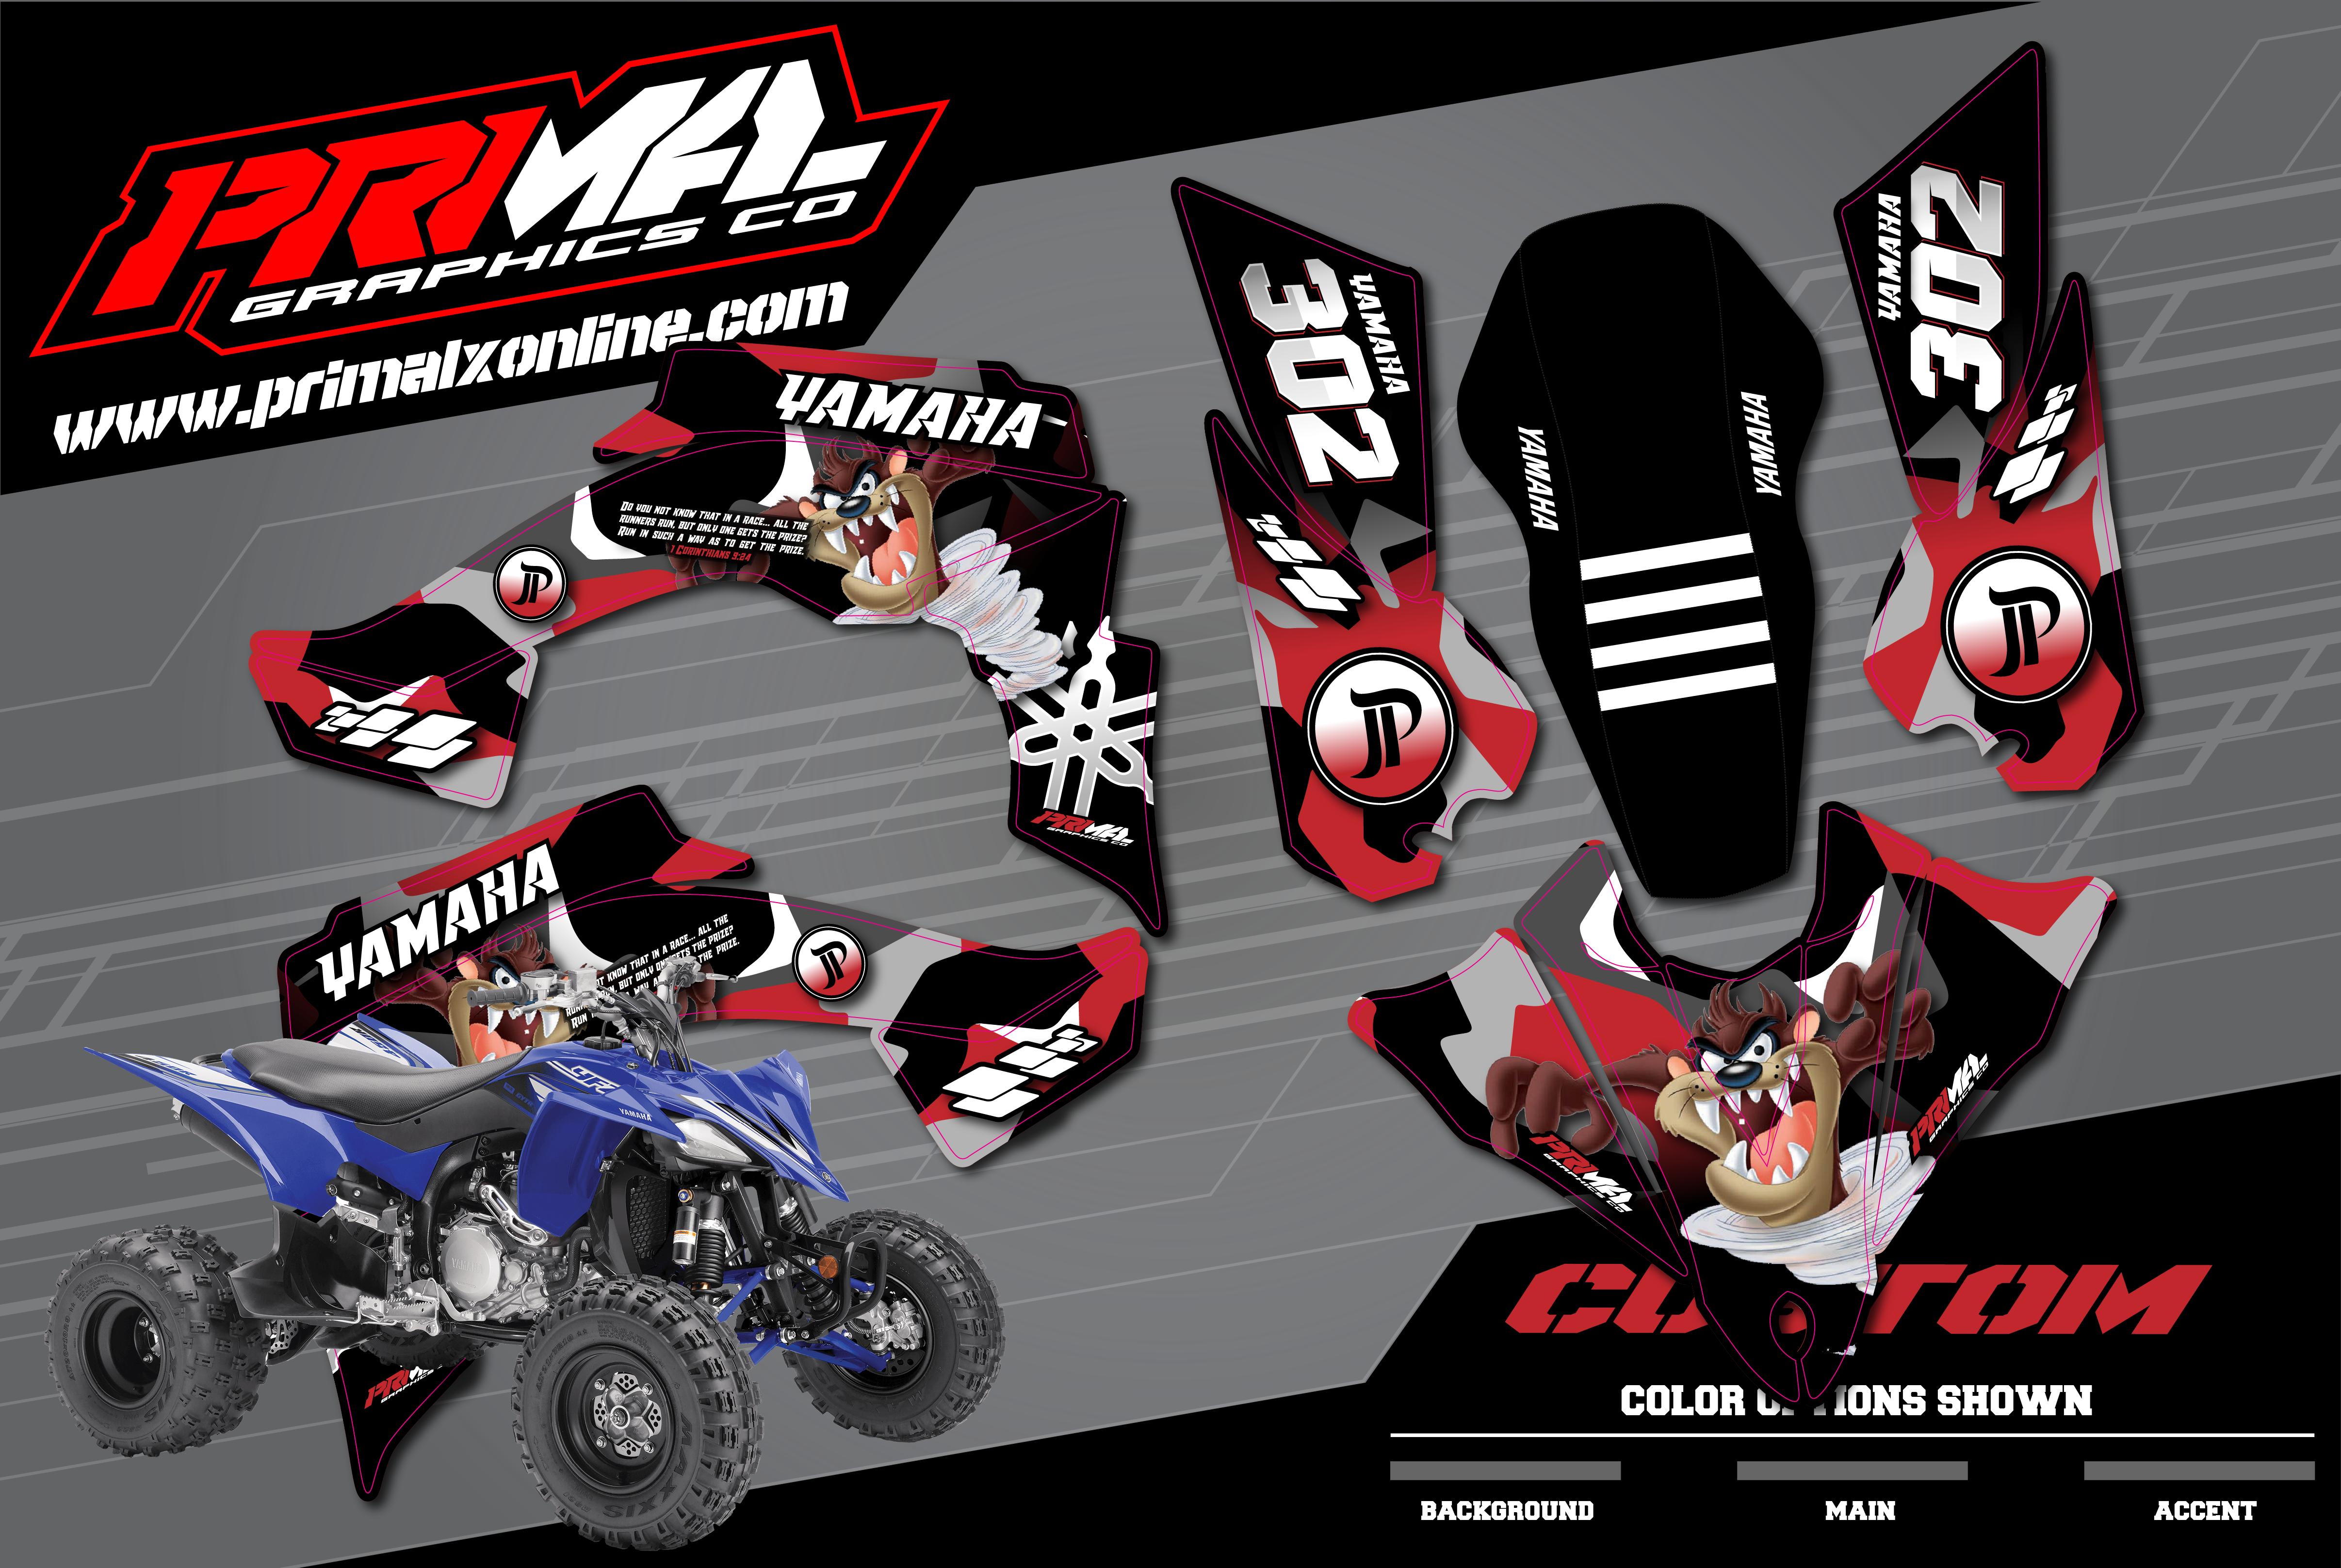 1_PRIMAL-X-MOTORSPORTS-PRIMAL-GRAPHICS-CO-YAMAHA-YFZ450-YFZ-ATV-GRAPHICS-MX-GRAPHICS-MX-DECALS-QUAD-GRAPHICS-APE-SERIES-CUSTOM